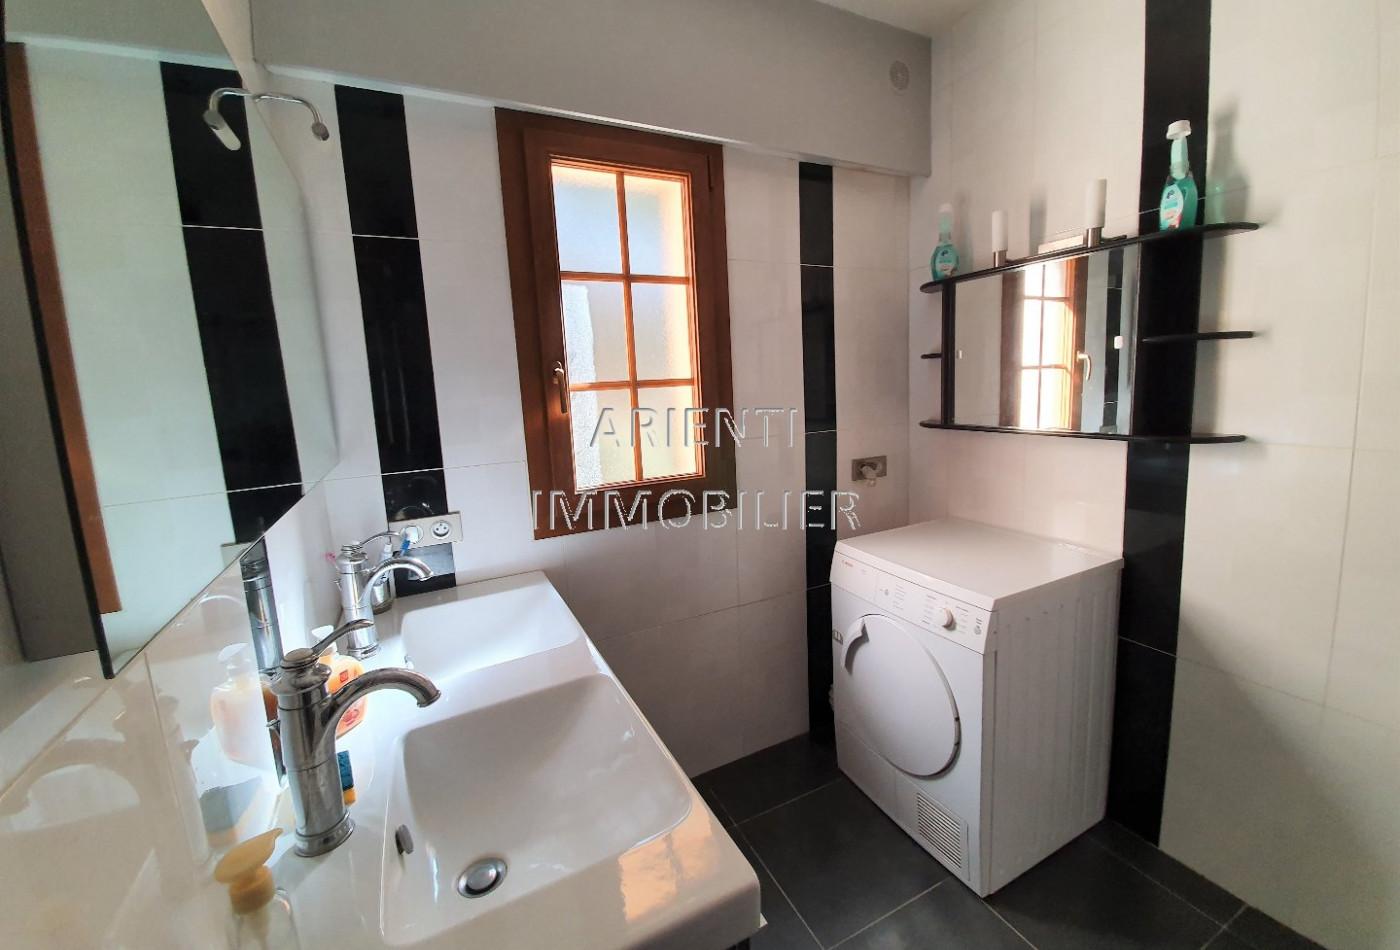 A vendre  Taulignan | Réf 260013161 - Office immobilier arienti